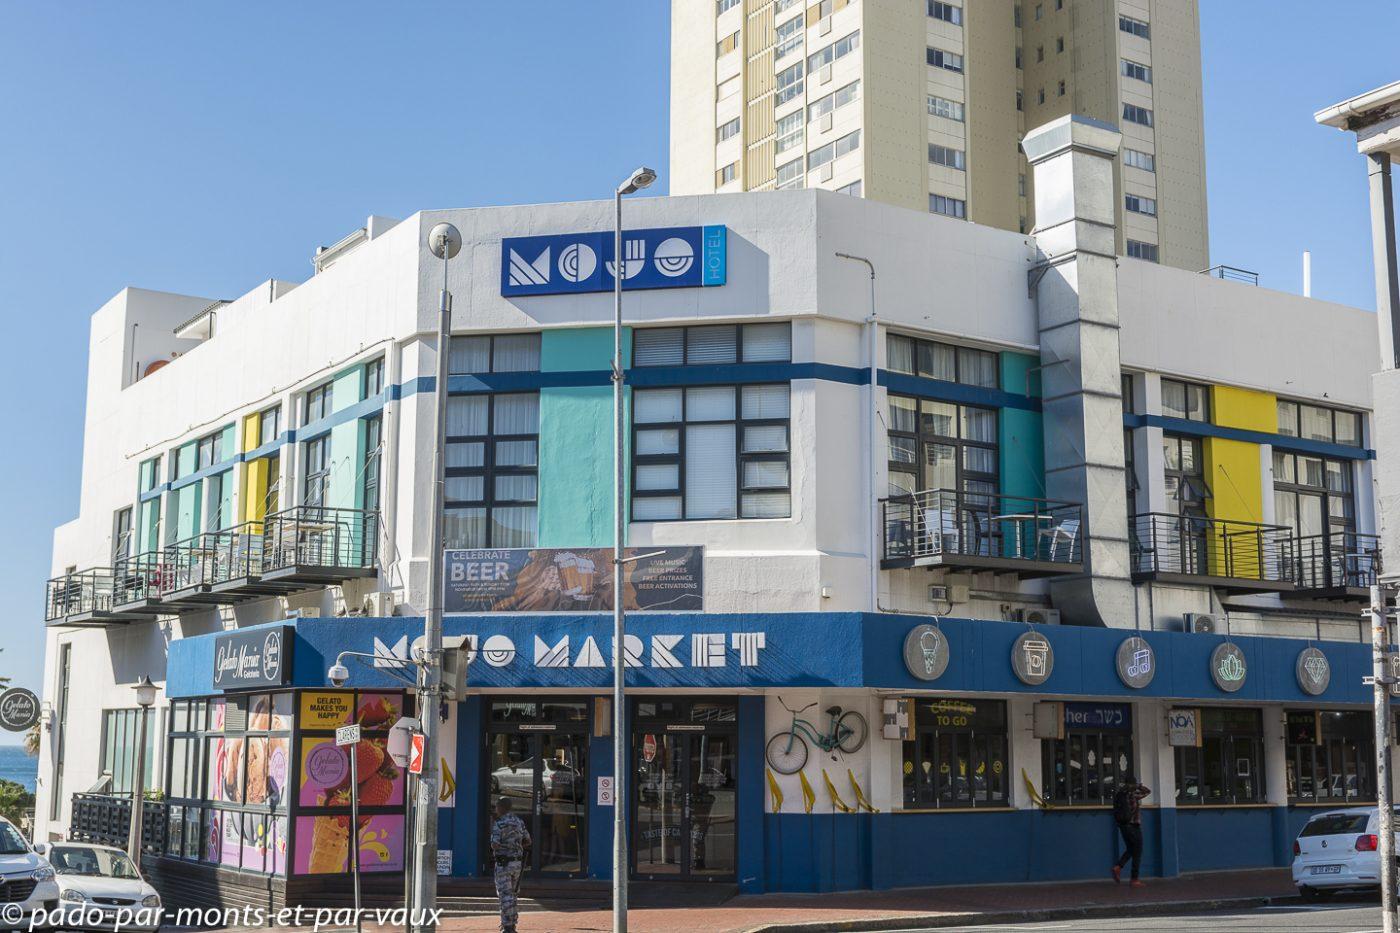 Cape Town -  Mojo market